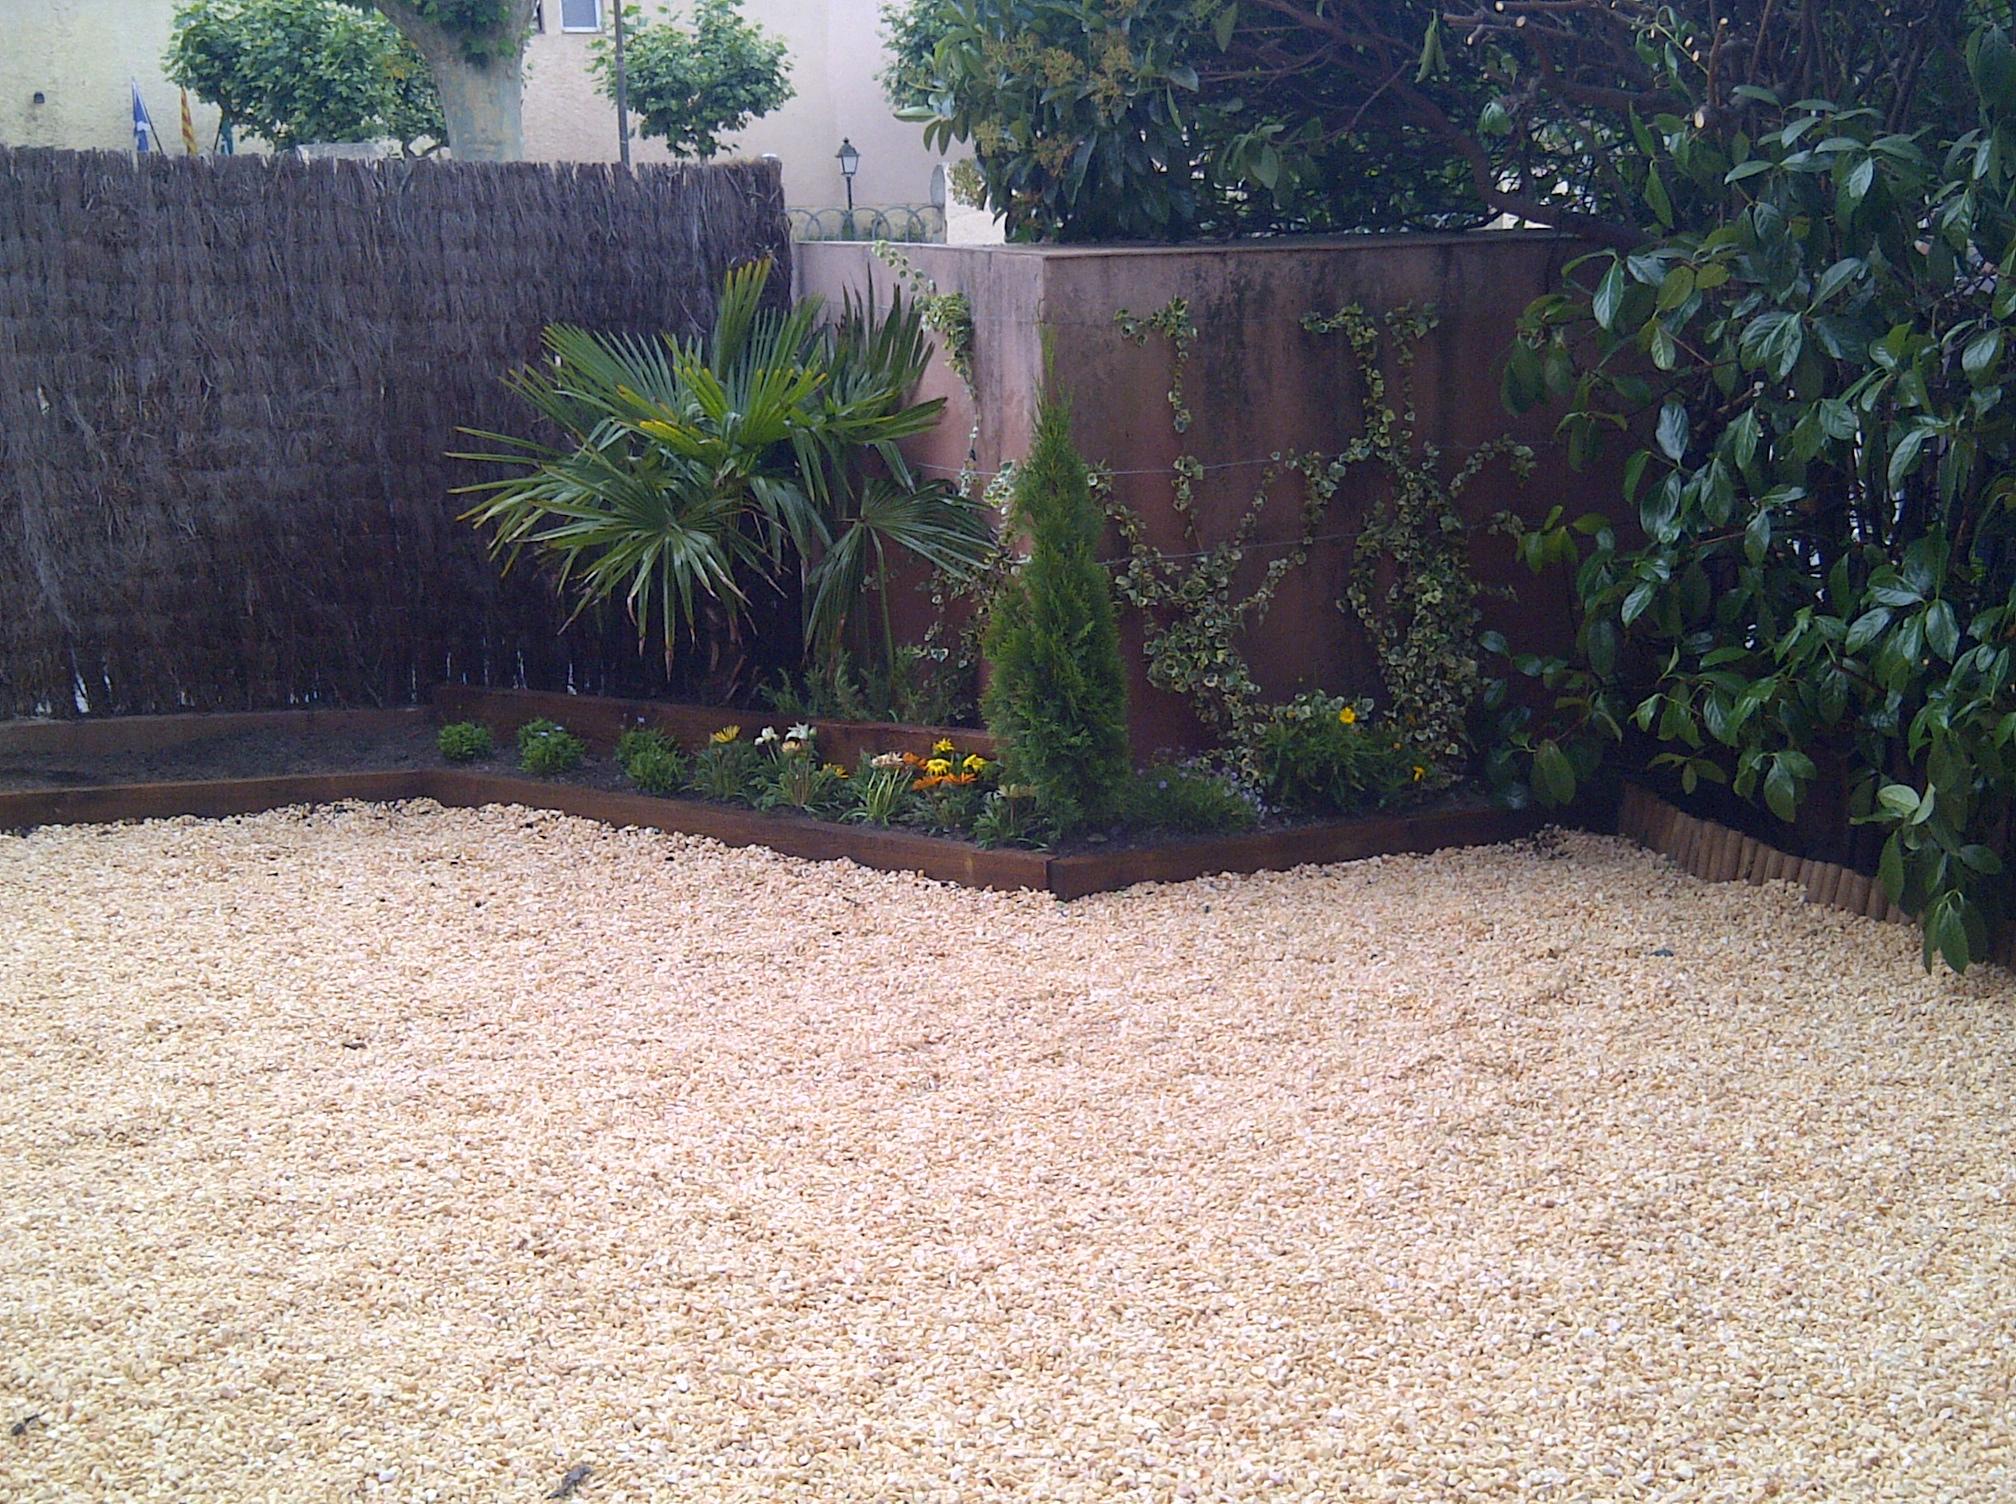 mejorando un jard n envejecido jordi pujol jardiner